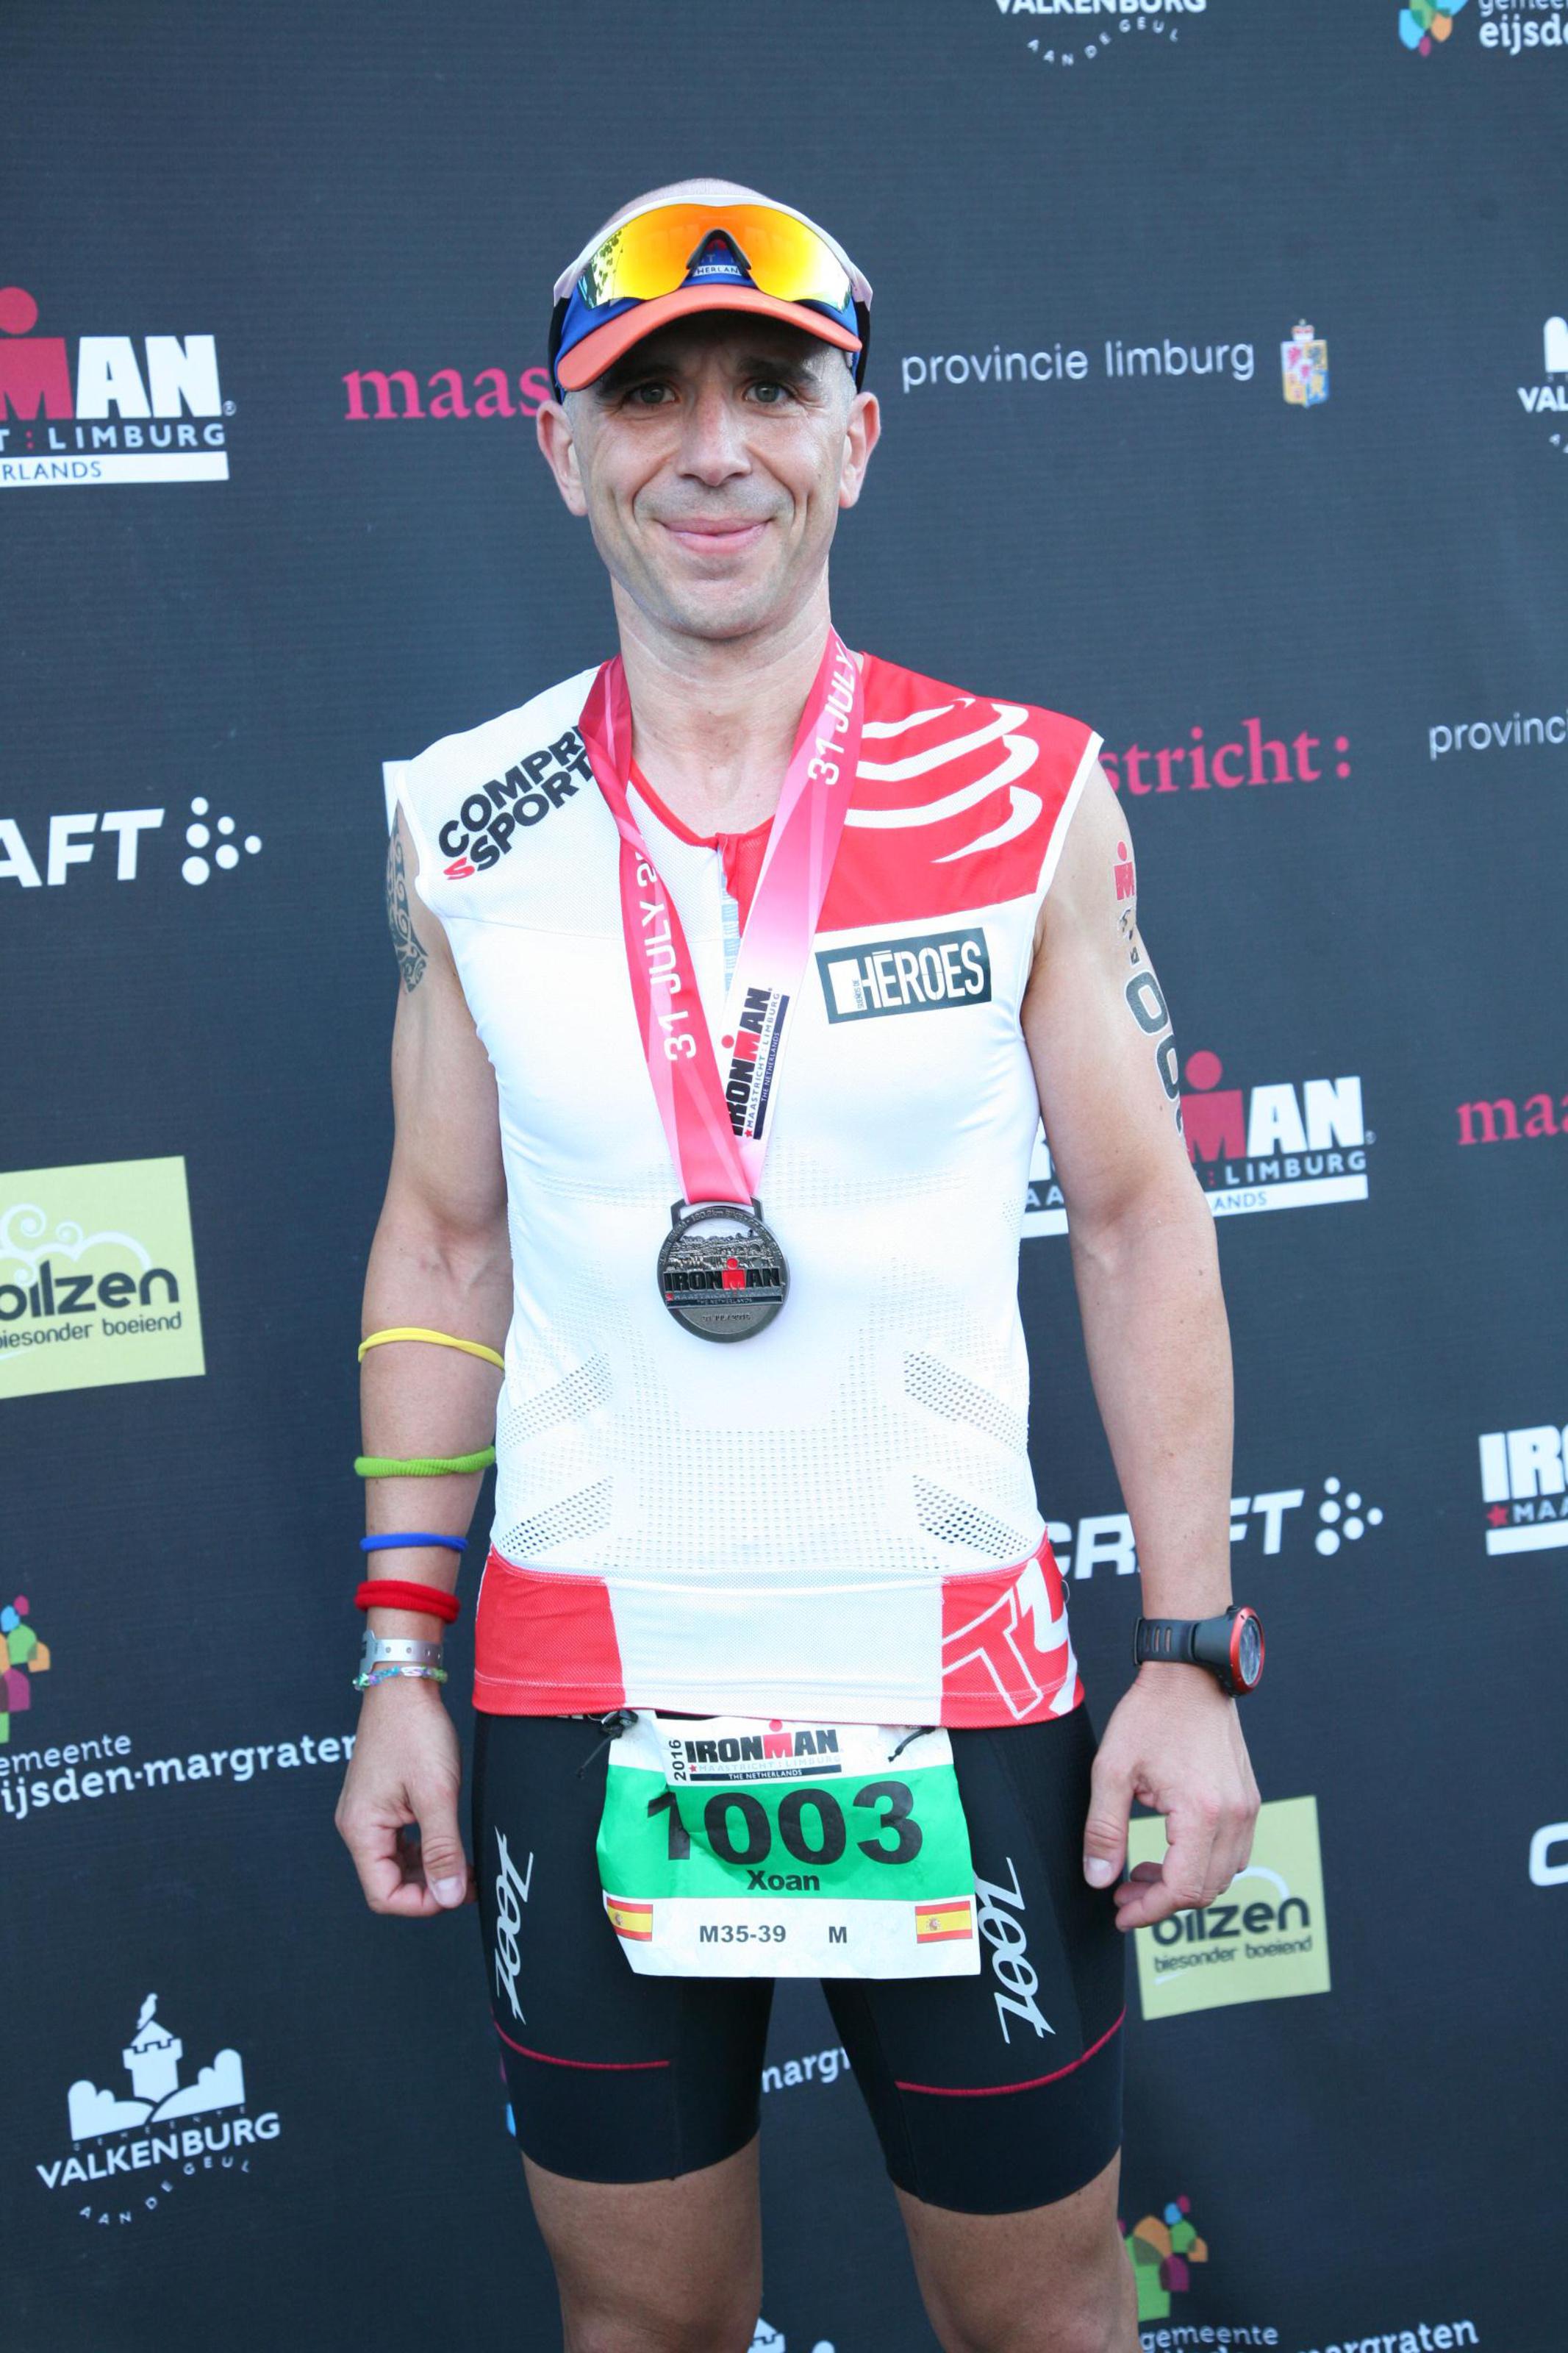 Ironman Maastrich (Holanda) 2016